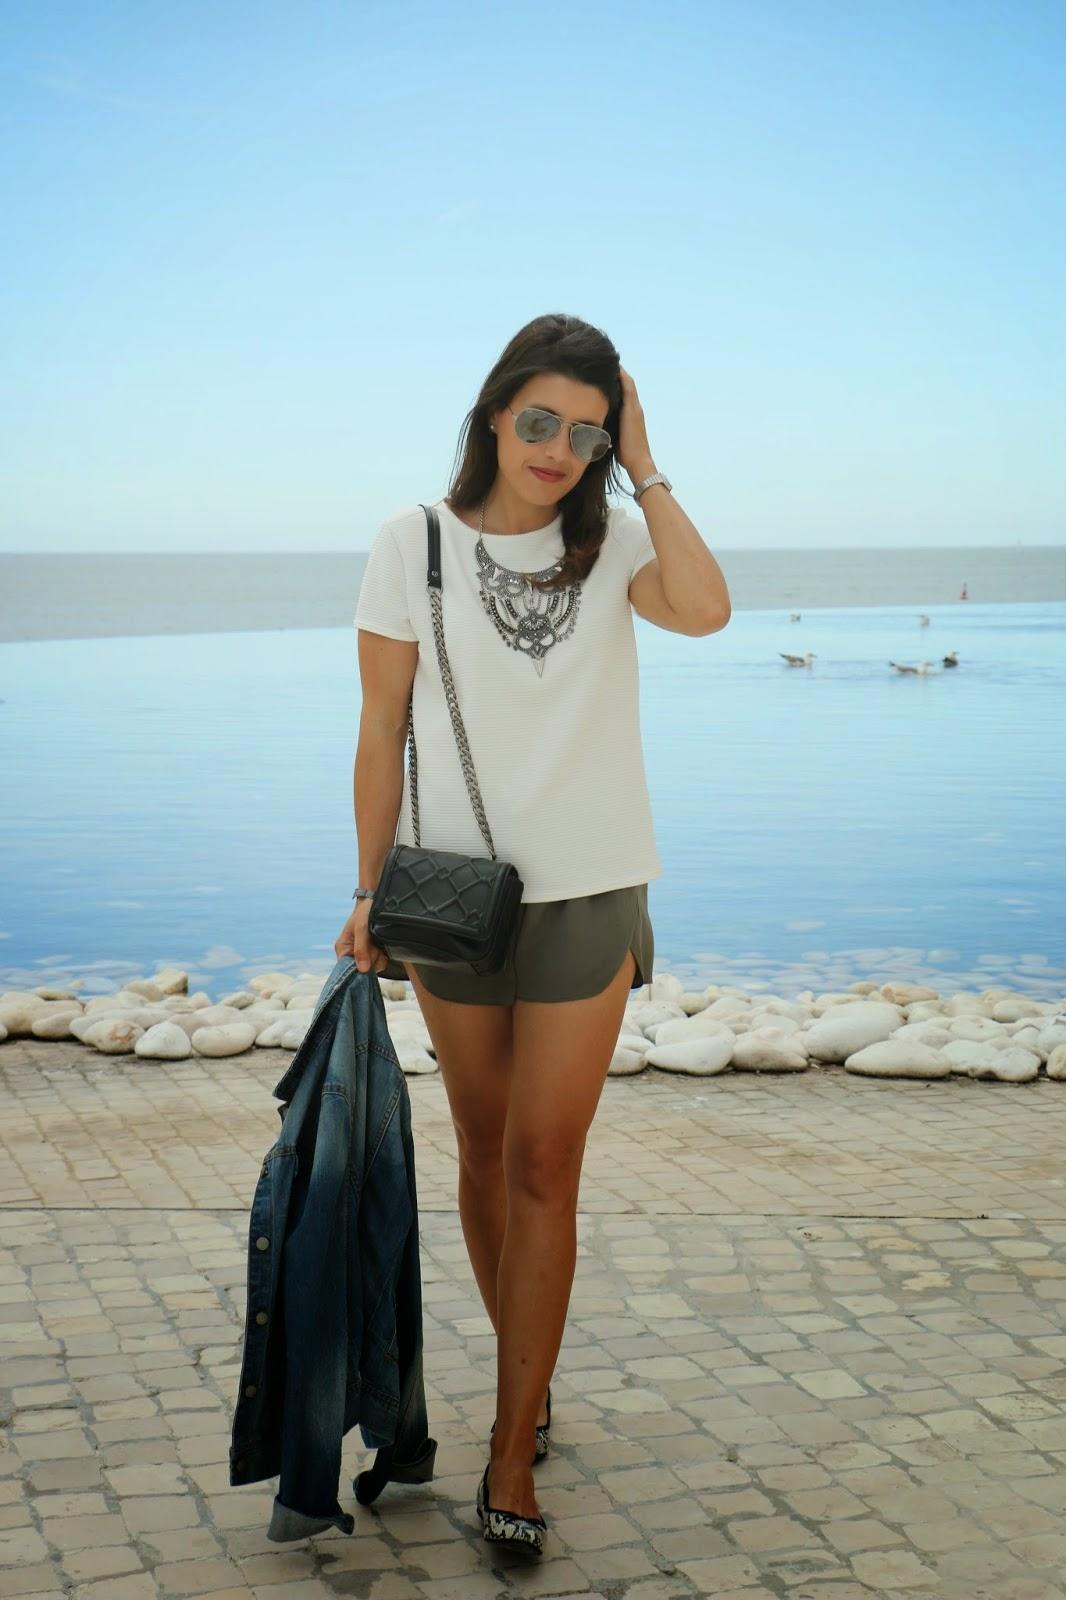 http://ilovefitametrica.blogspot.pt/2014/06/caqui-shorts.html